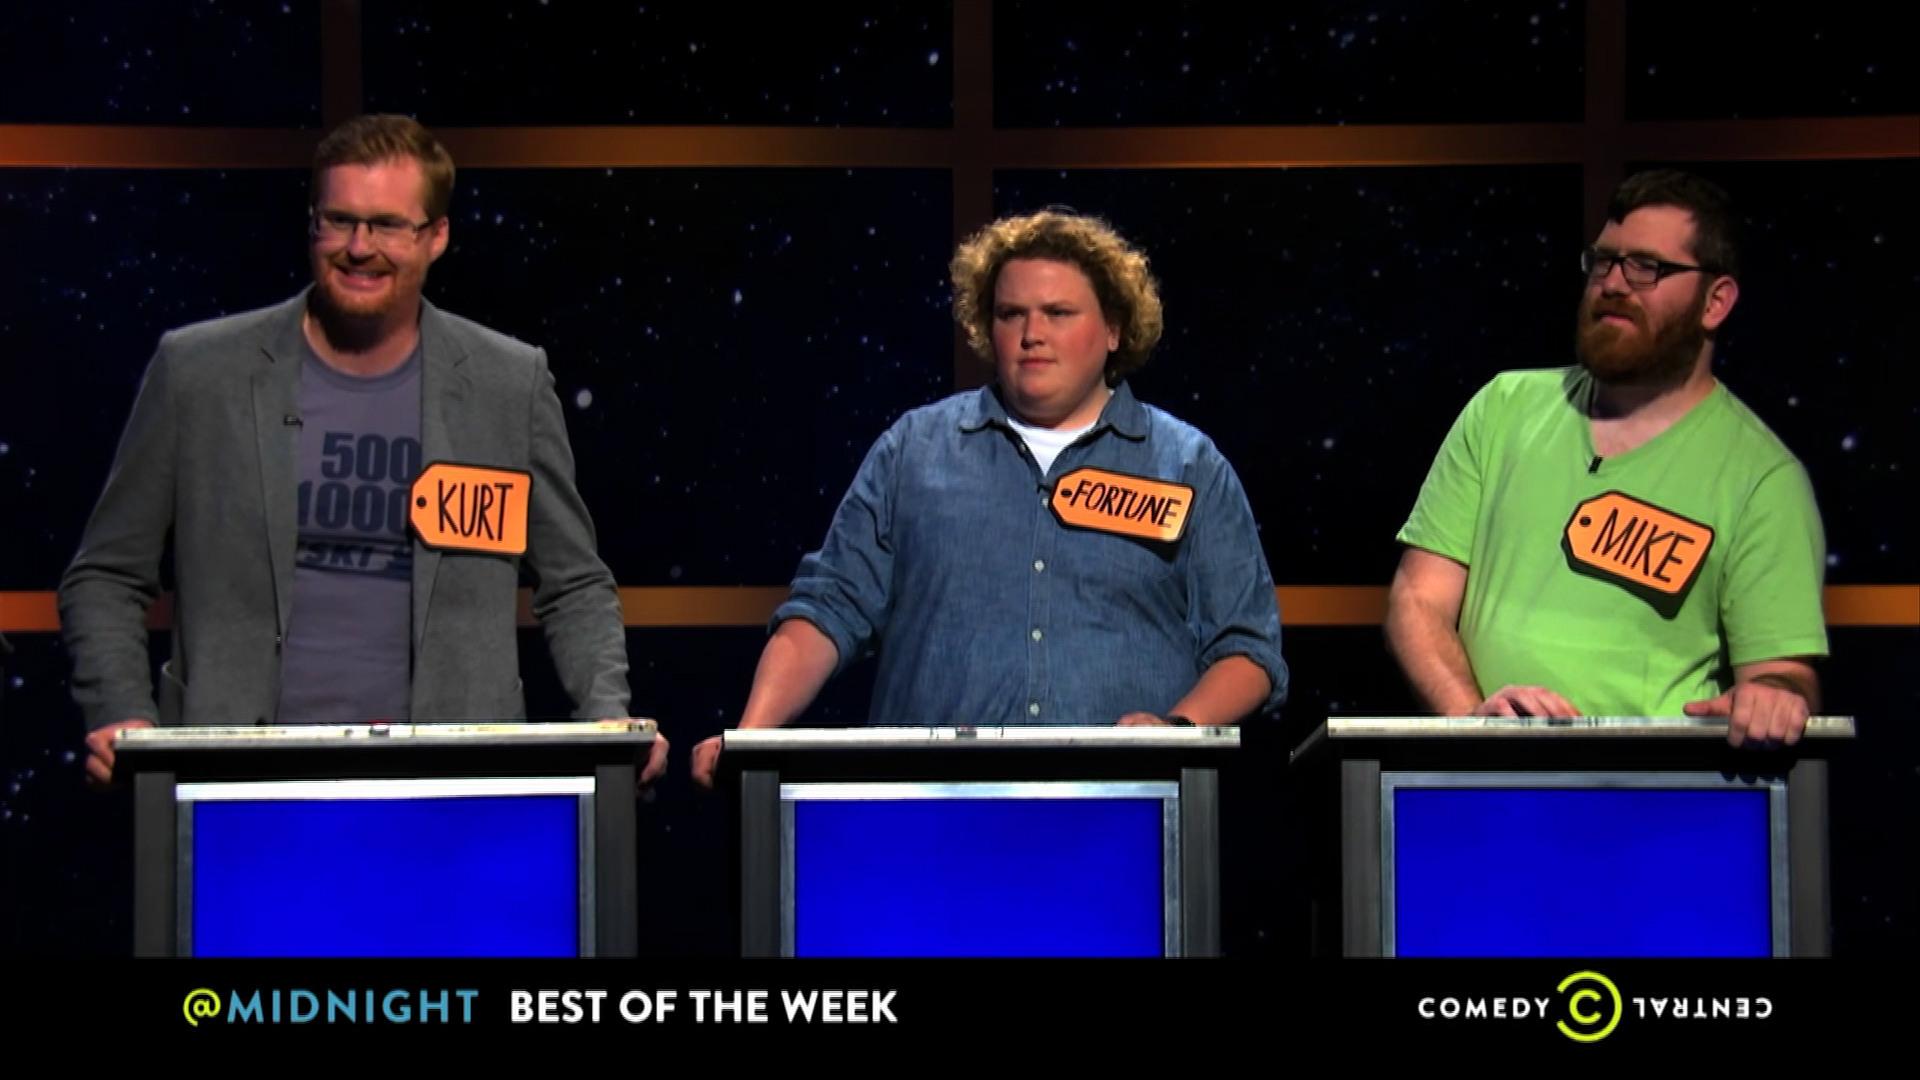 Best of the Week of 5/19/14